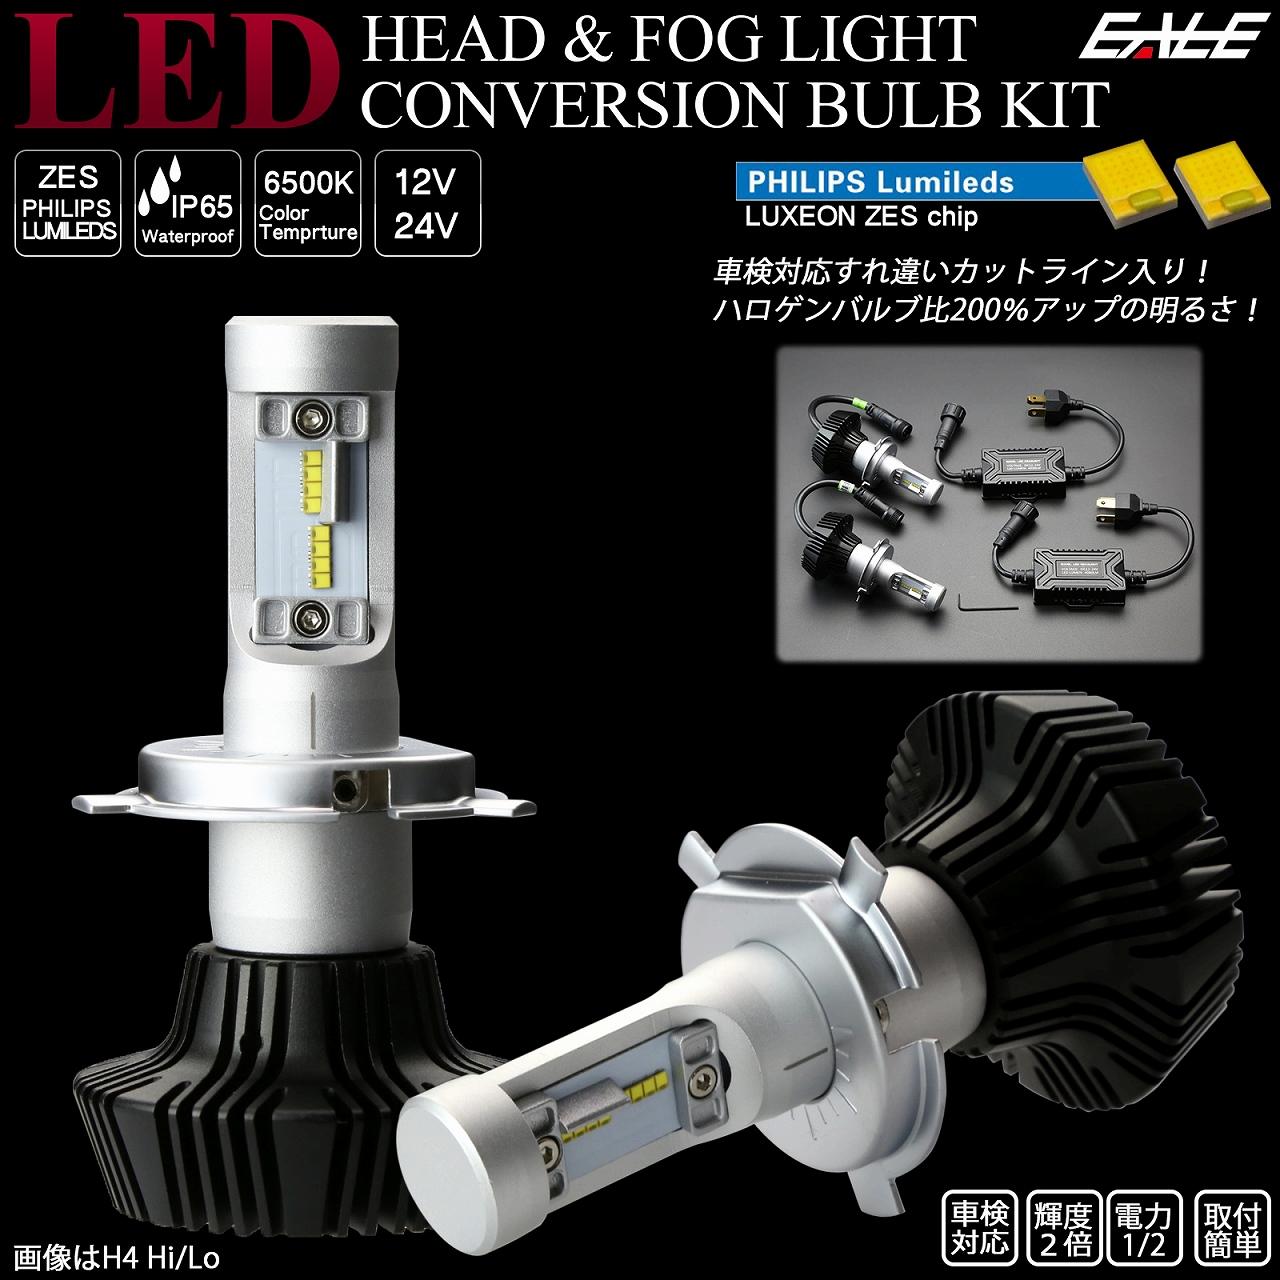 LEDヘッドライト LEDヘッドランプ H4 バルブ バーナー 6500K DC12V 24V H-97